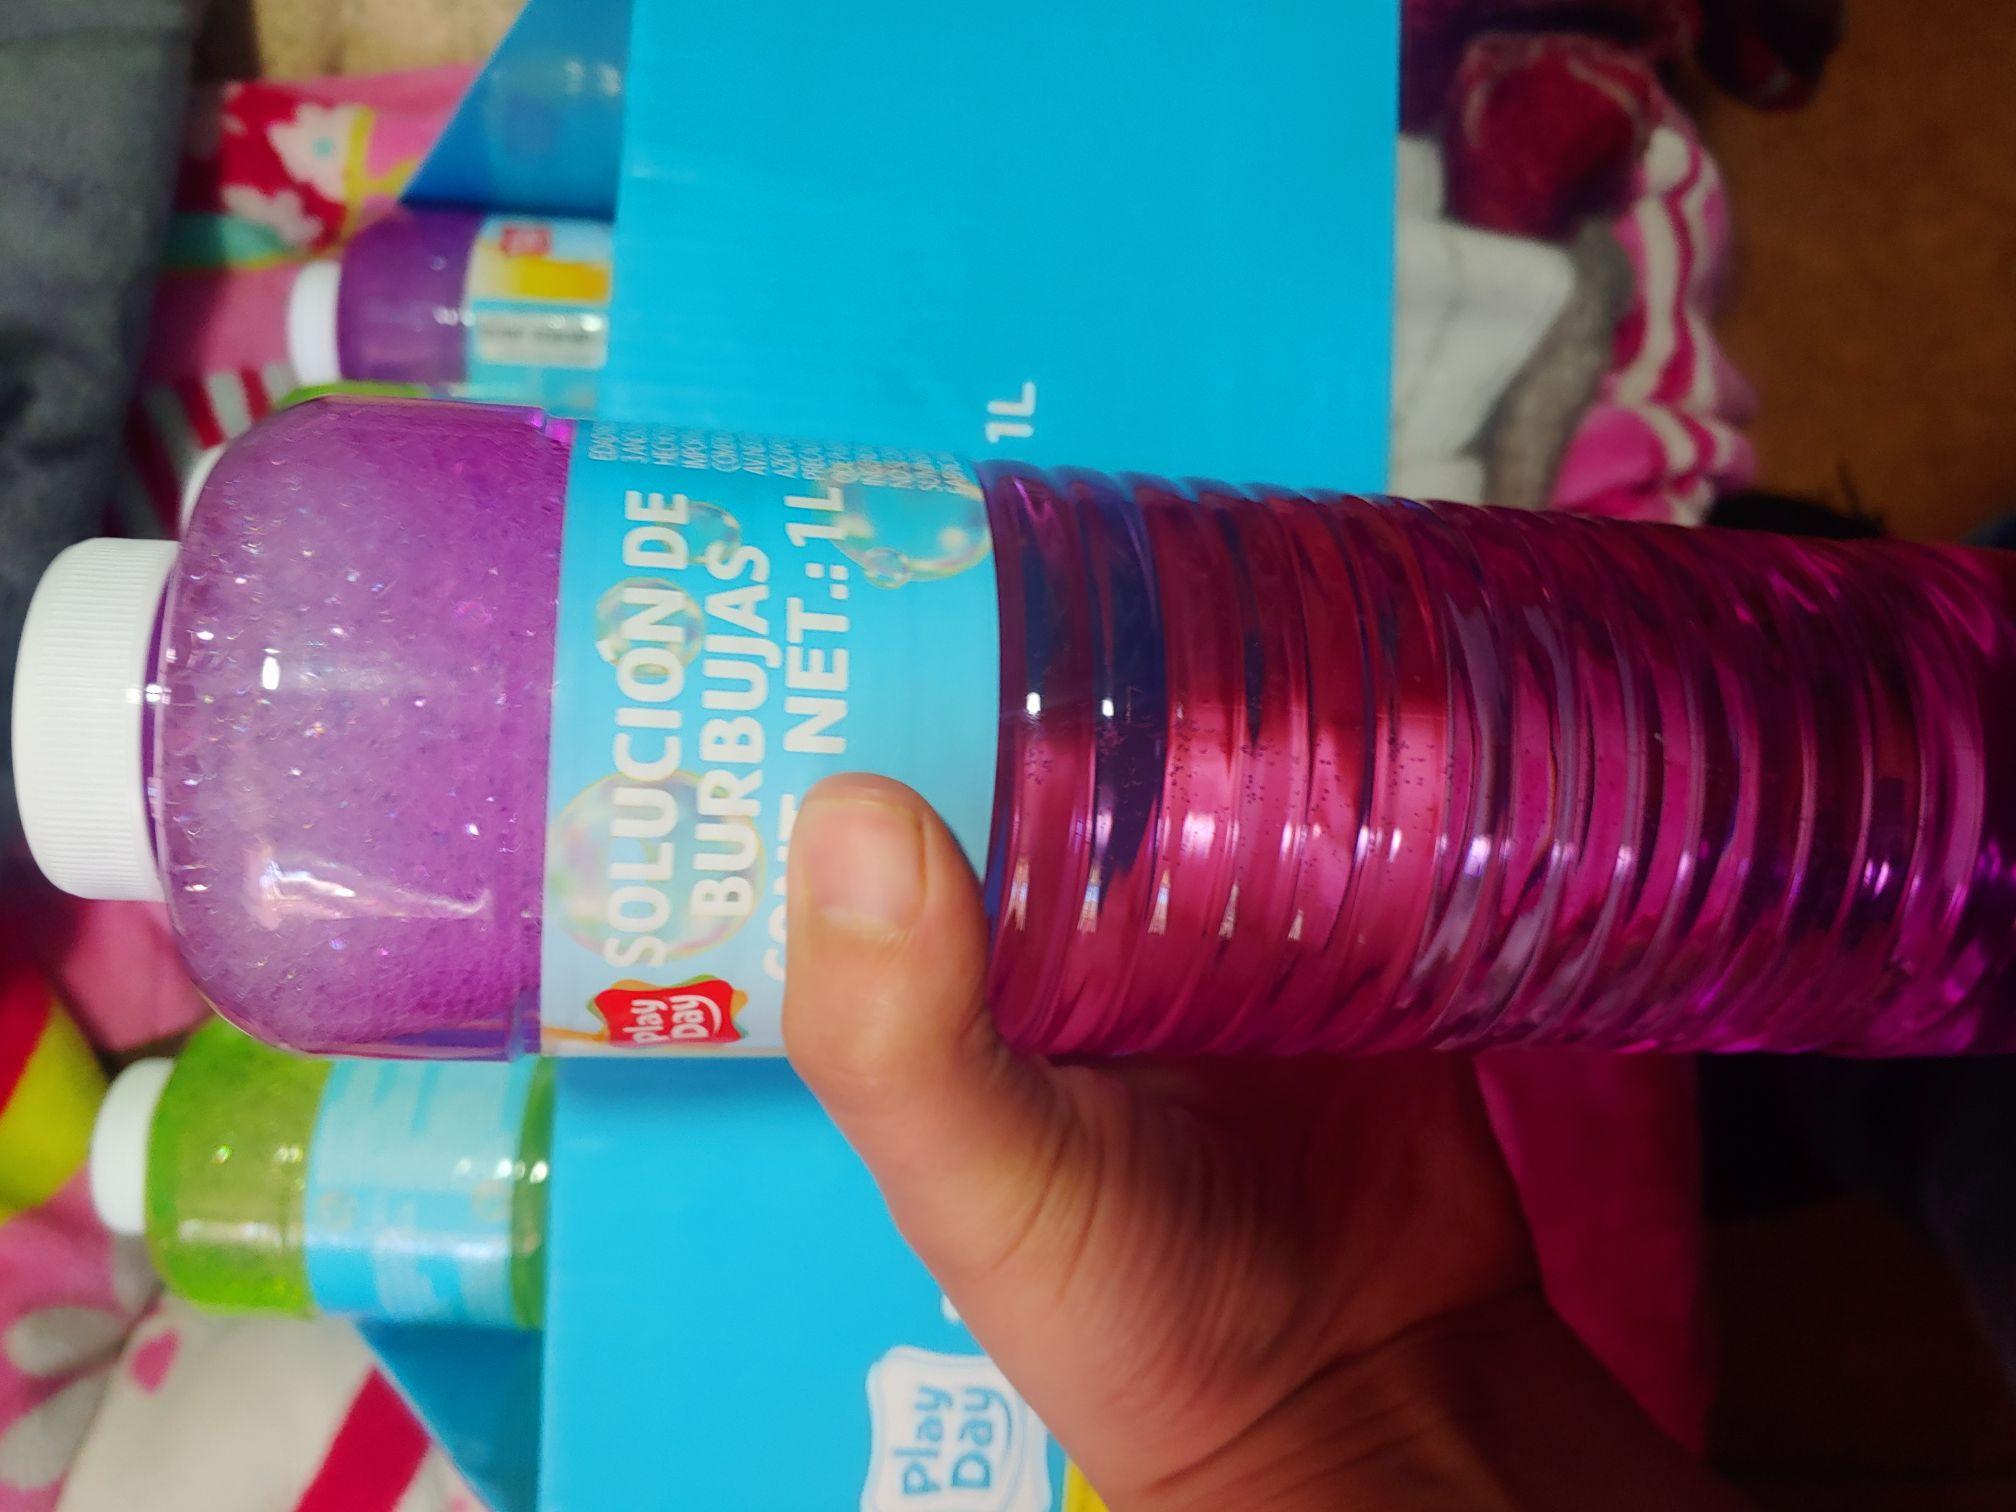 Liquido para burbujas 1litro / Bodega Aurrera